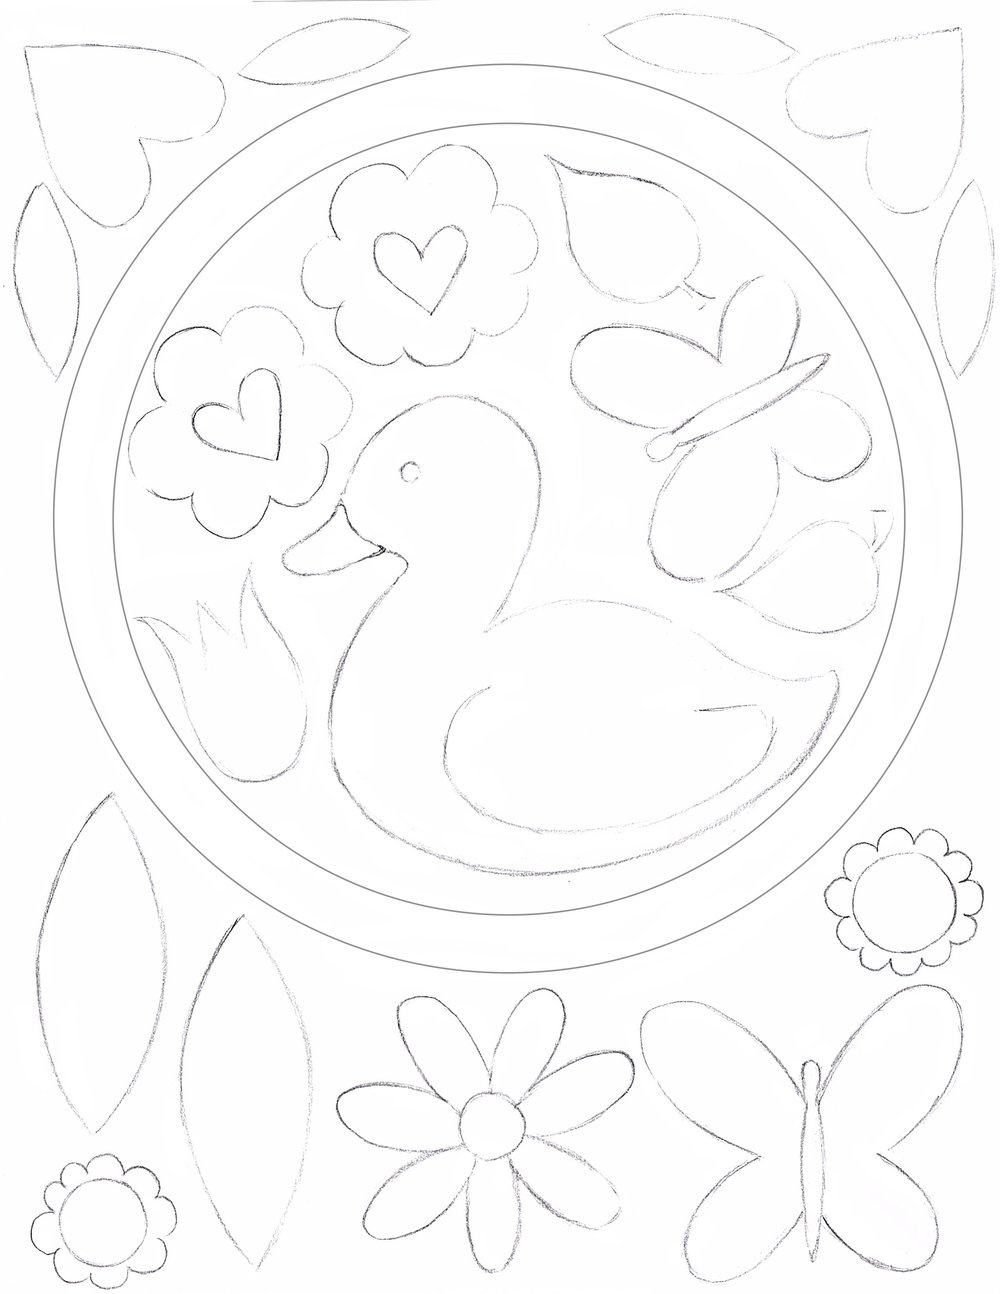 SpringtimeWreath.jpg